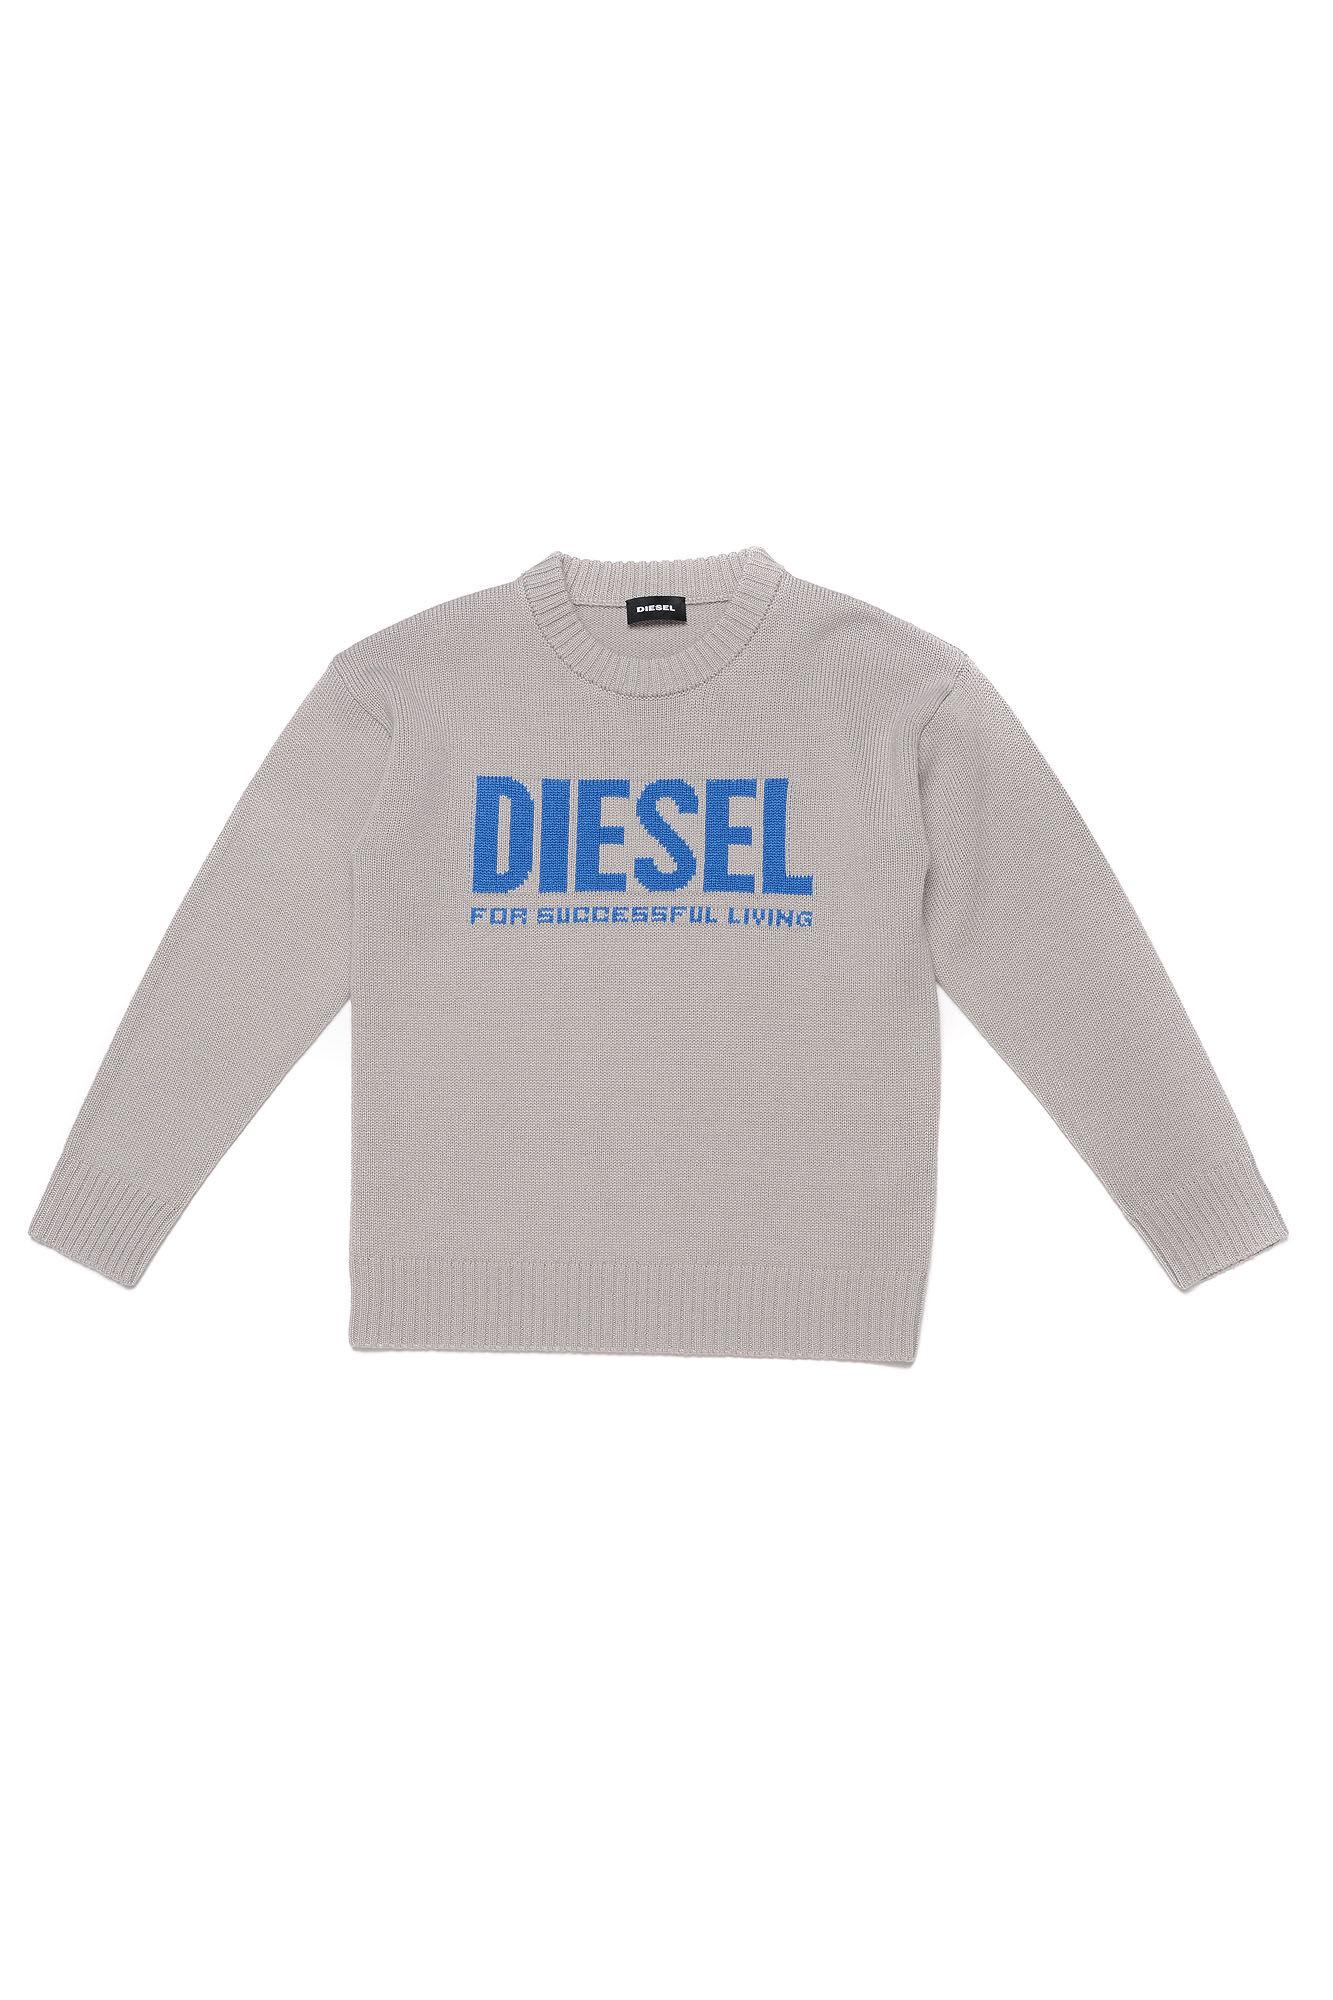 Klogosx Jersey - Diesel Kid